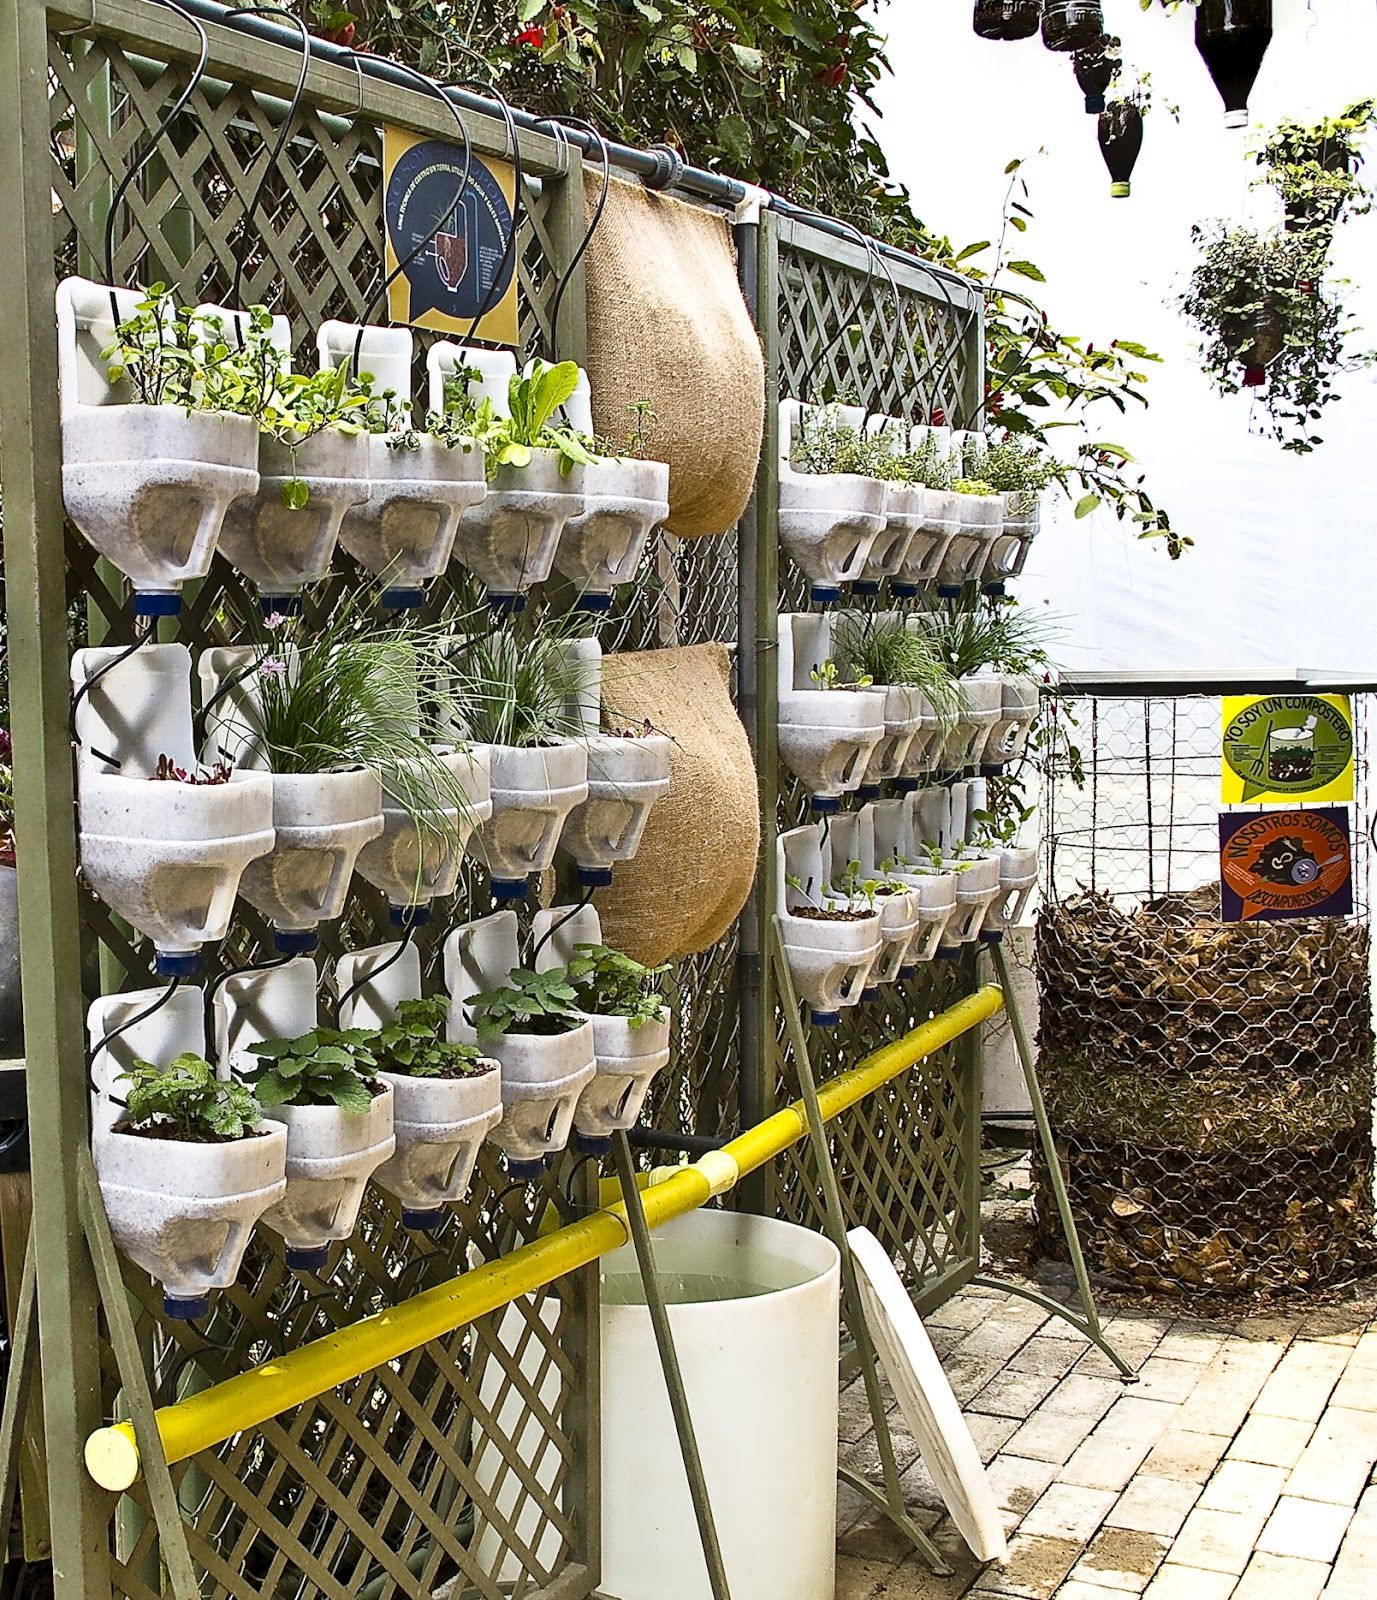 Jardin vertical plantas aromaticas buscar con google para mi casa pinterest gardens and - Jardin verticale ...